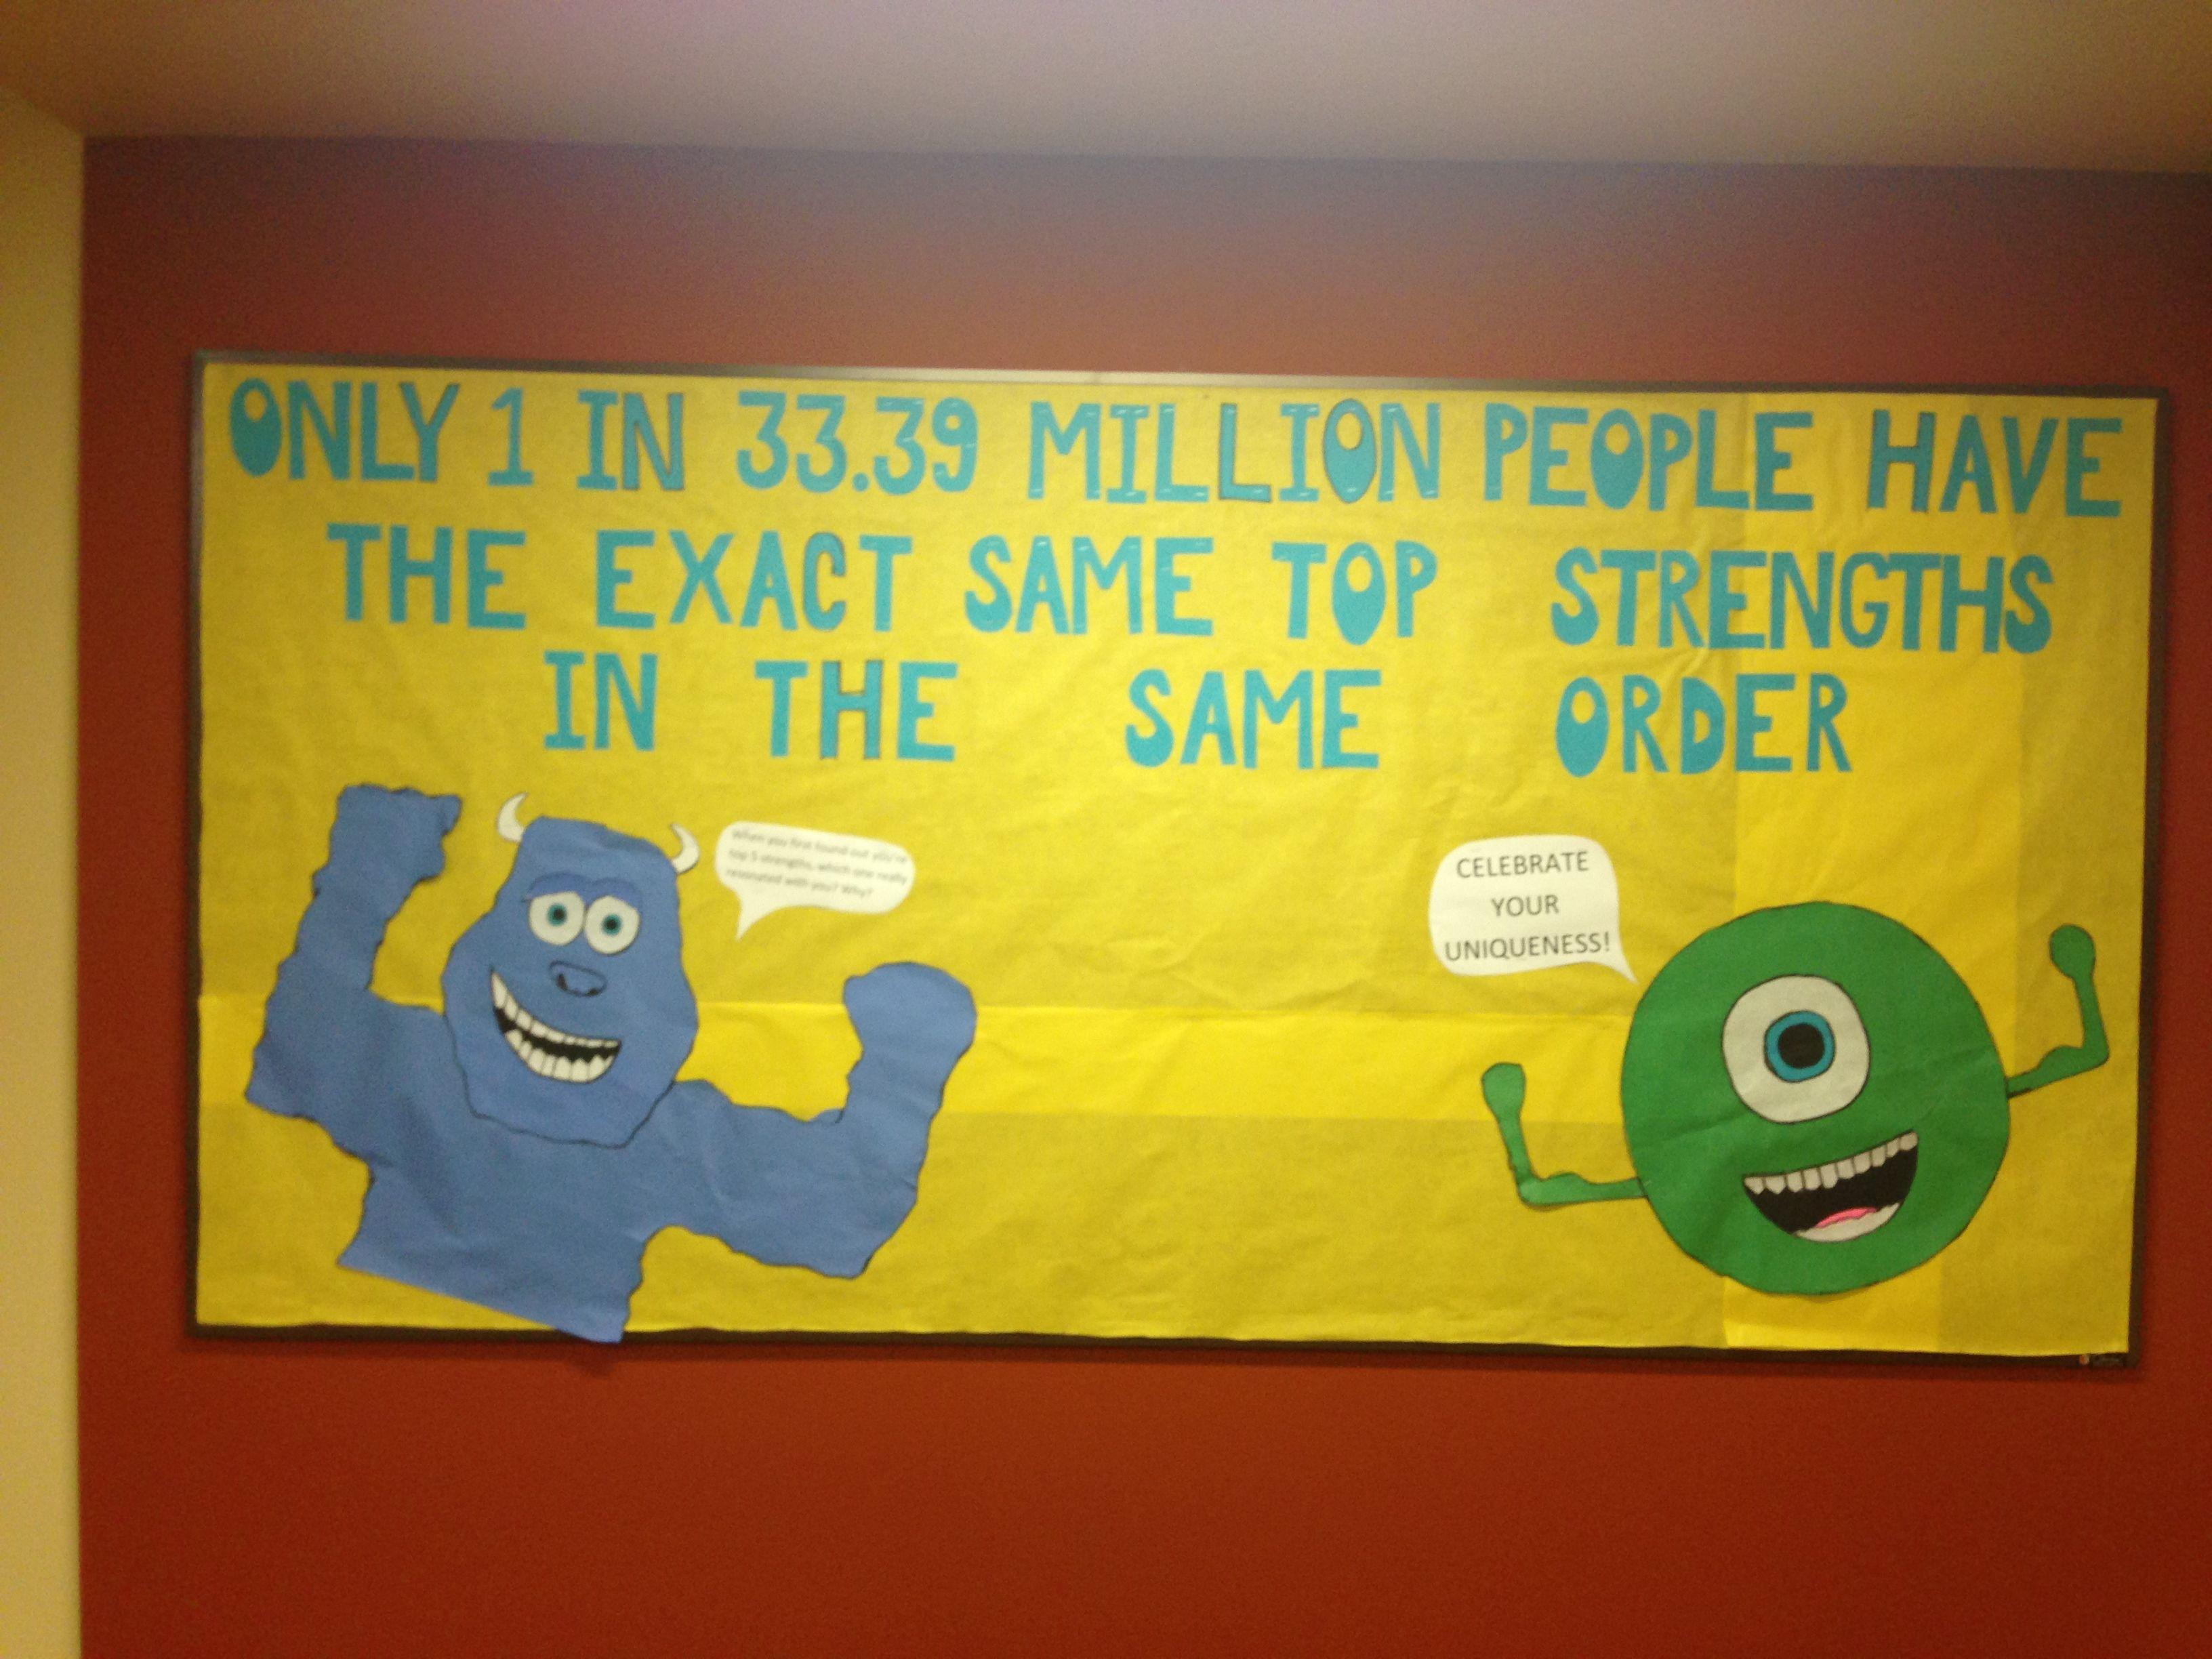 Monsters inc strengths billboard | RA | Pinterest | Billboard and ...